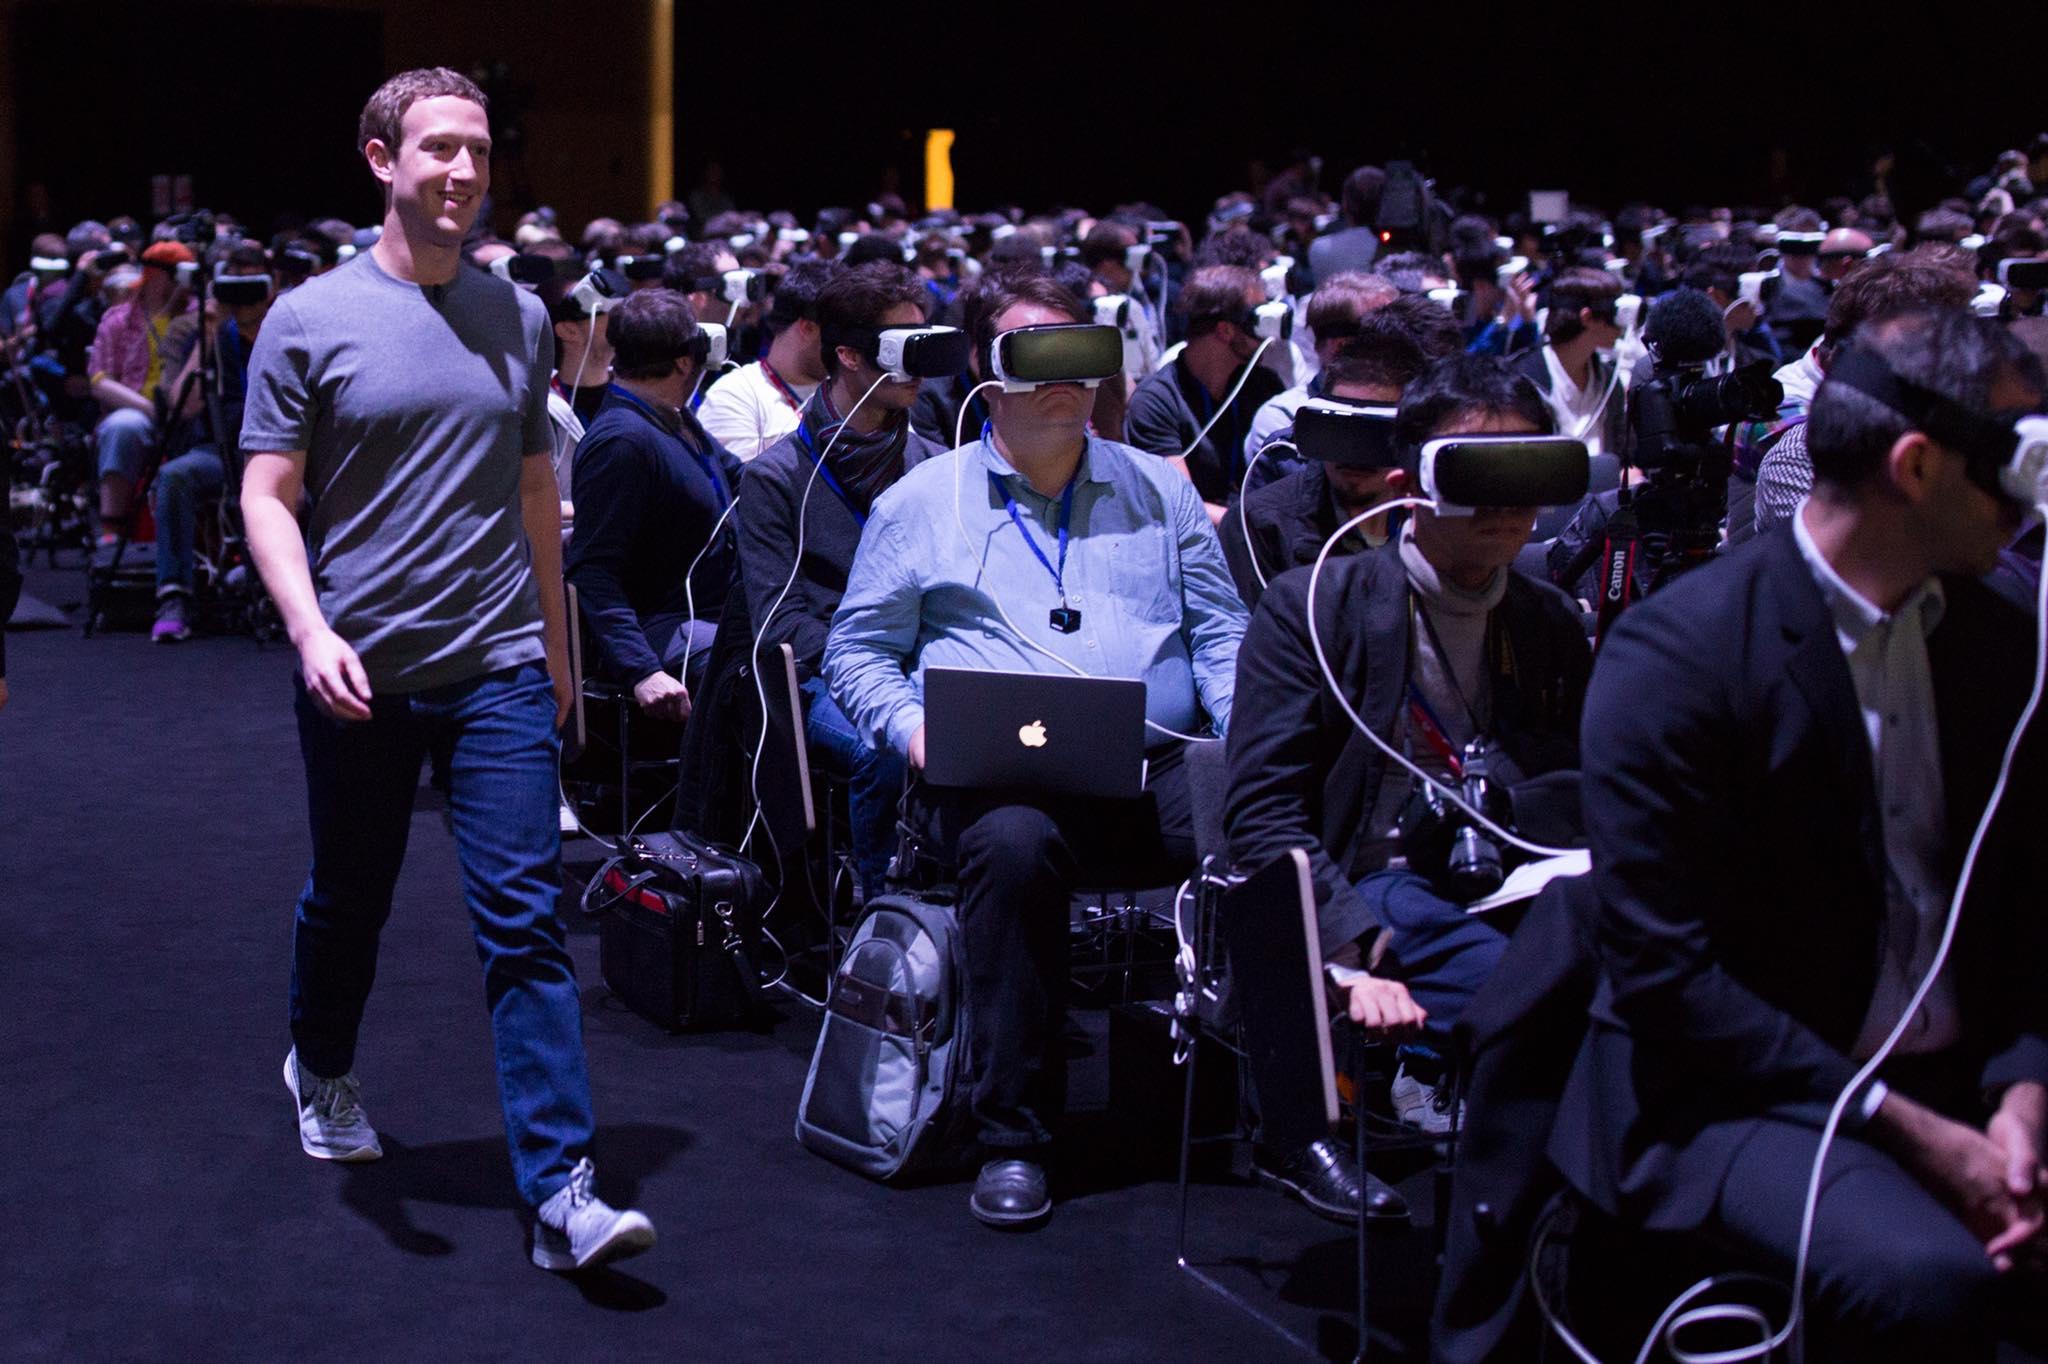 MS_VR